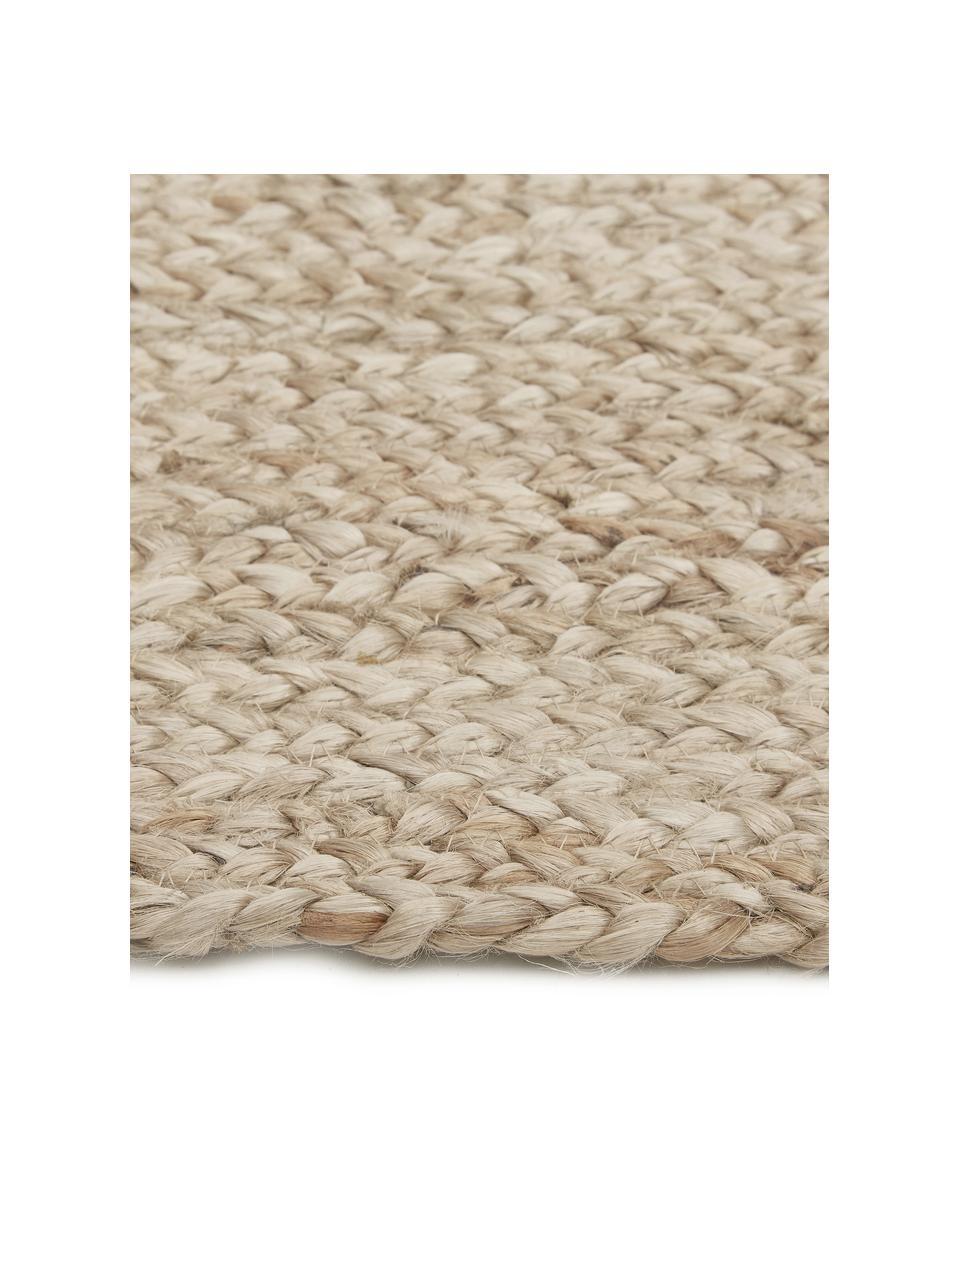 Tappeto in juta fatto a mano Sharmila, 100% juta, Beige, Larg. 200 x Lung. 300 cm (taglia L)